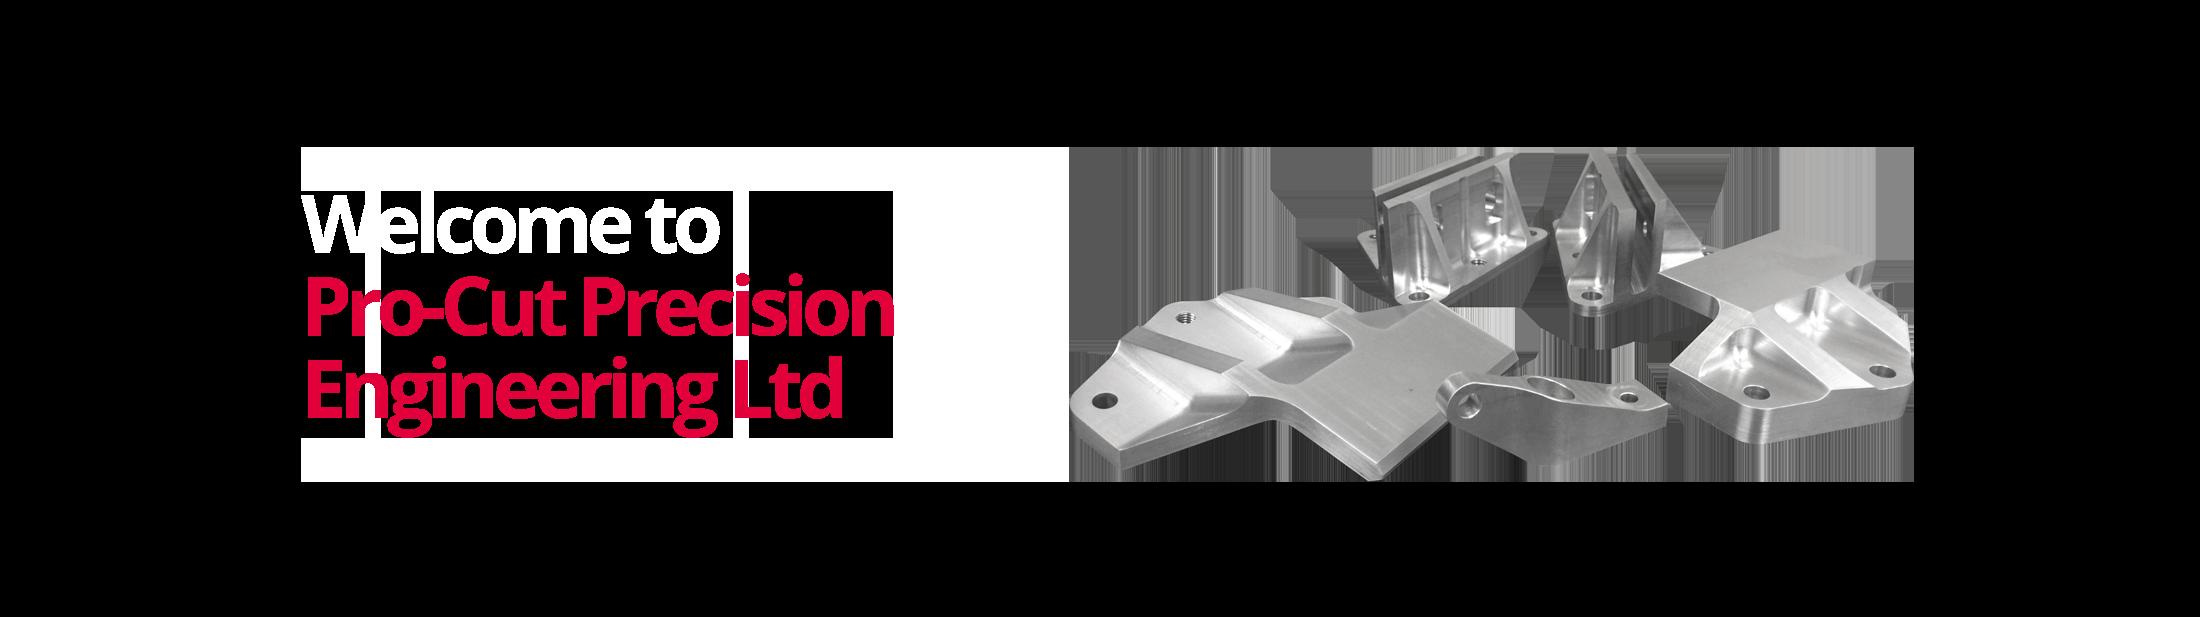 Pro-Cut Precision Engineering Ltd - Engineering Excellence in Milton Keynes